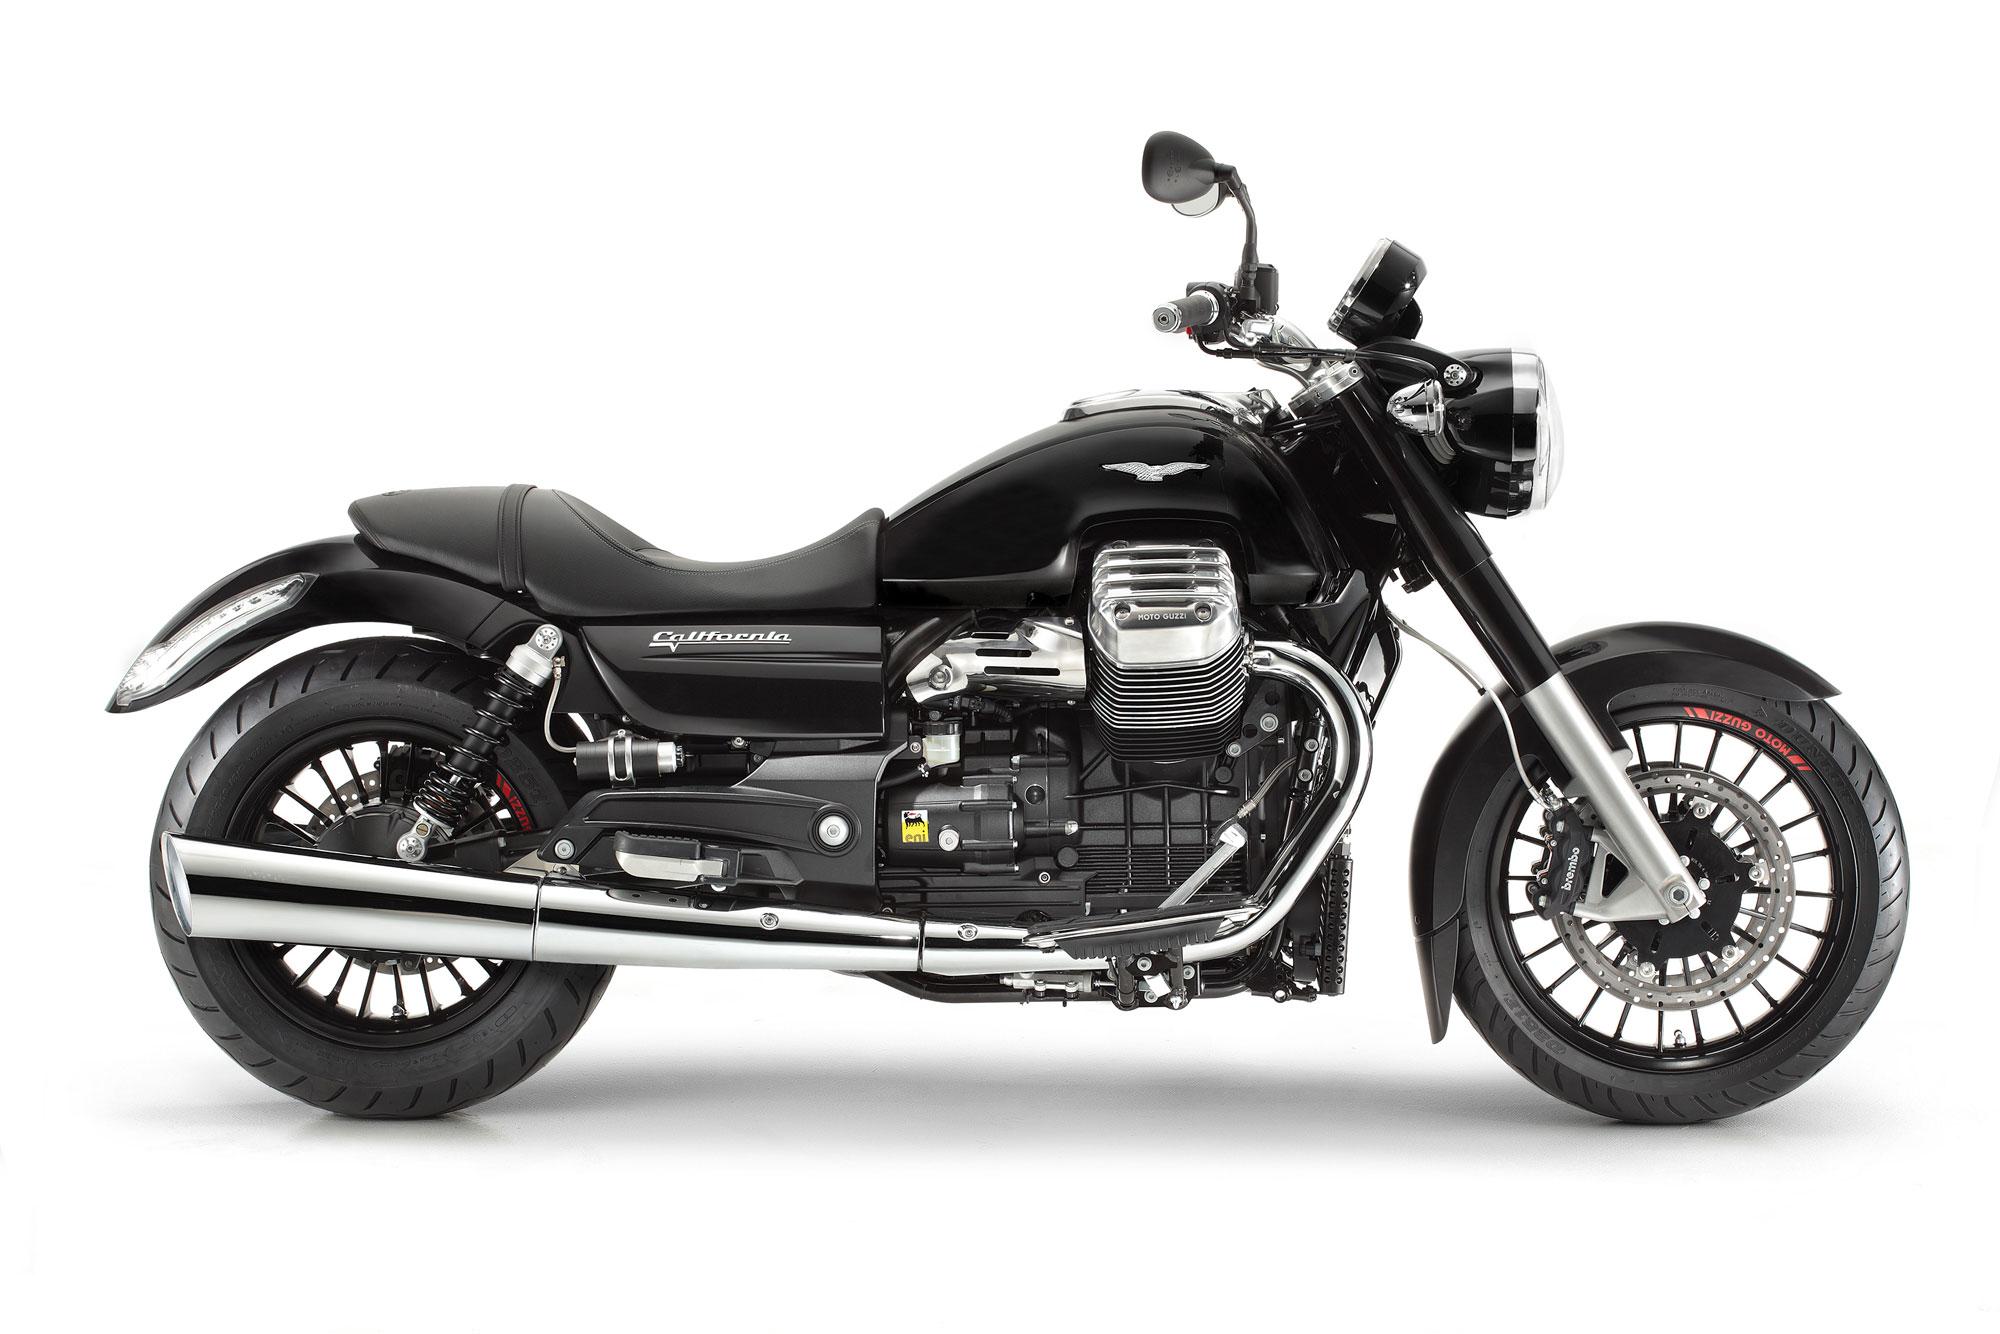 moto guzzi california 1400 custom specs - 2012, 2013 - autoevolution